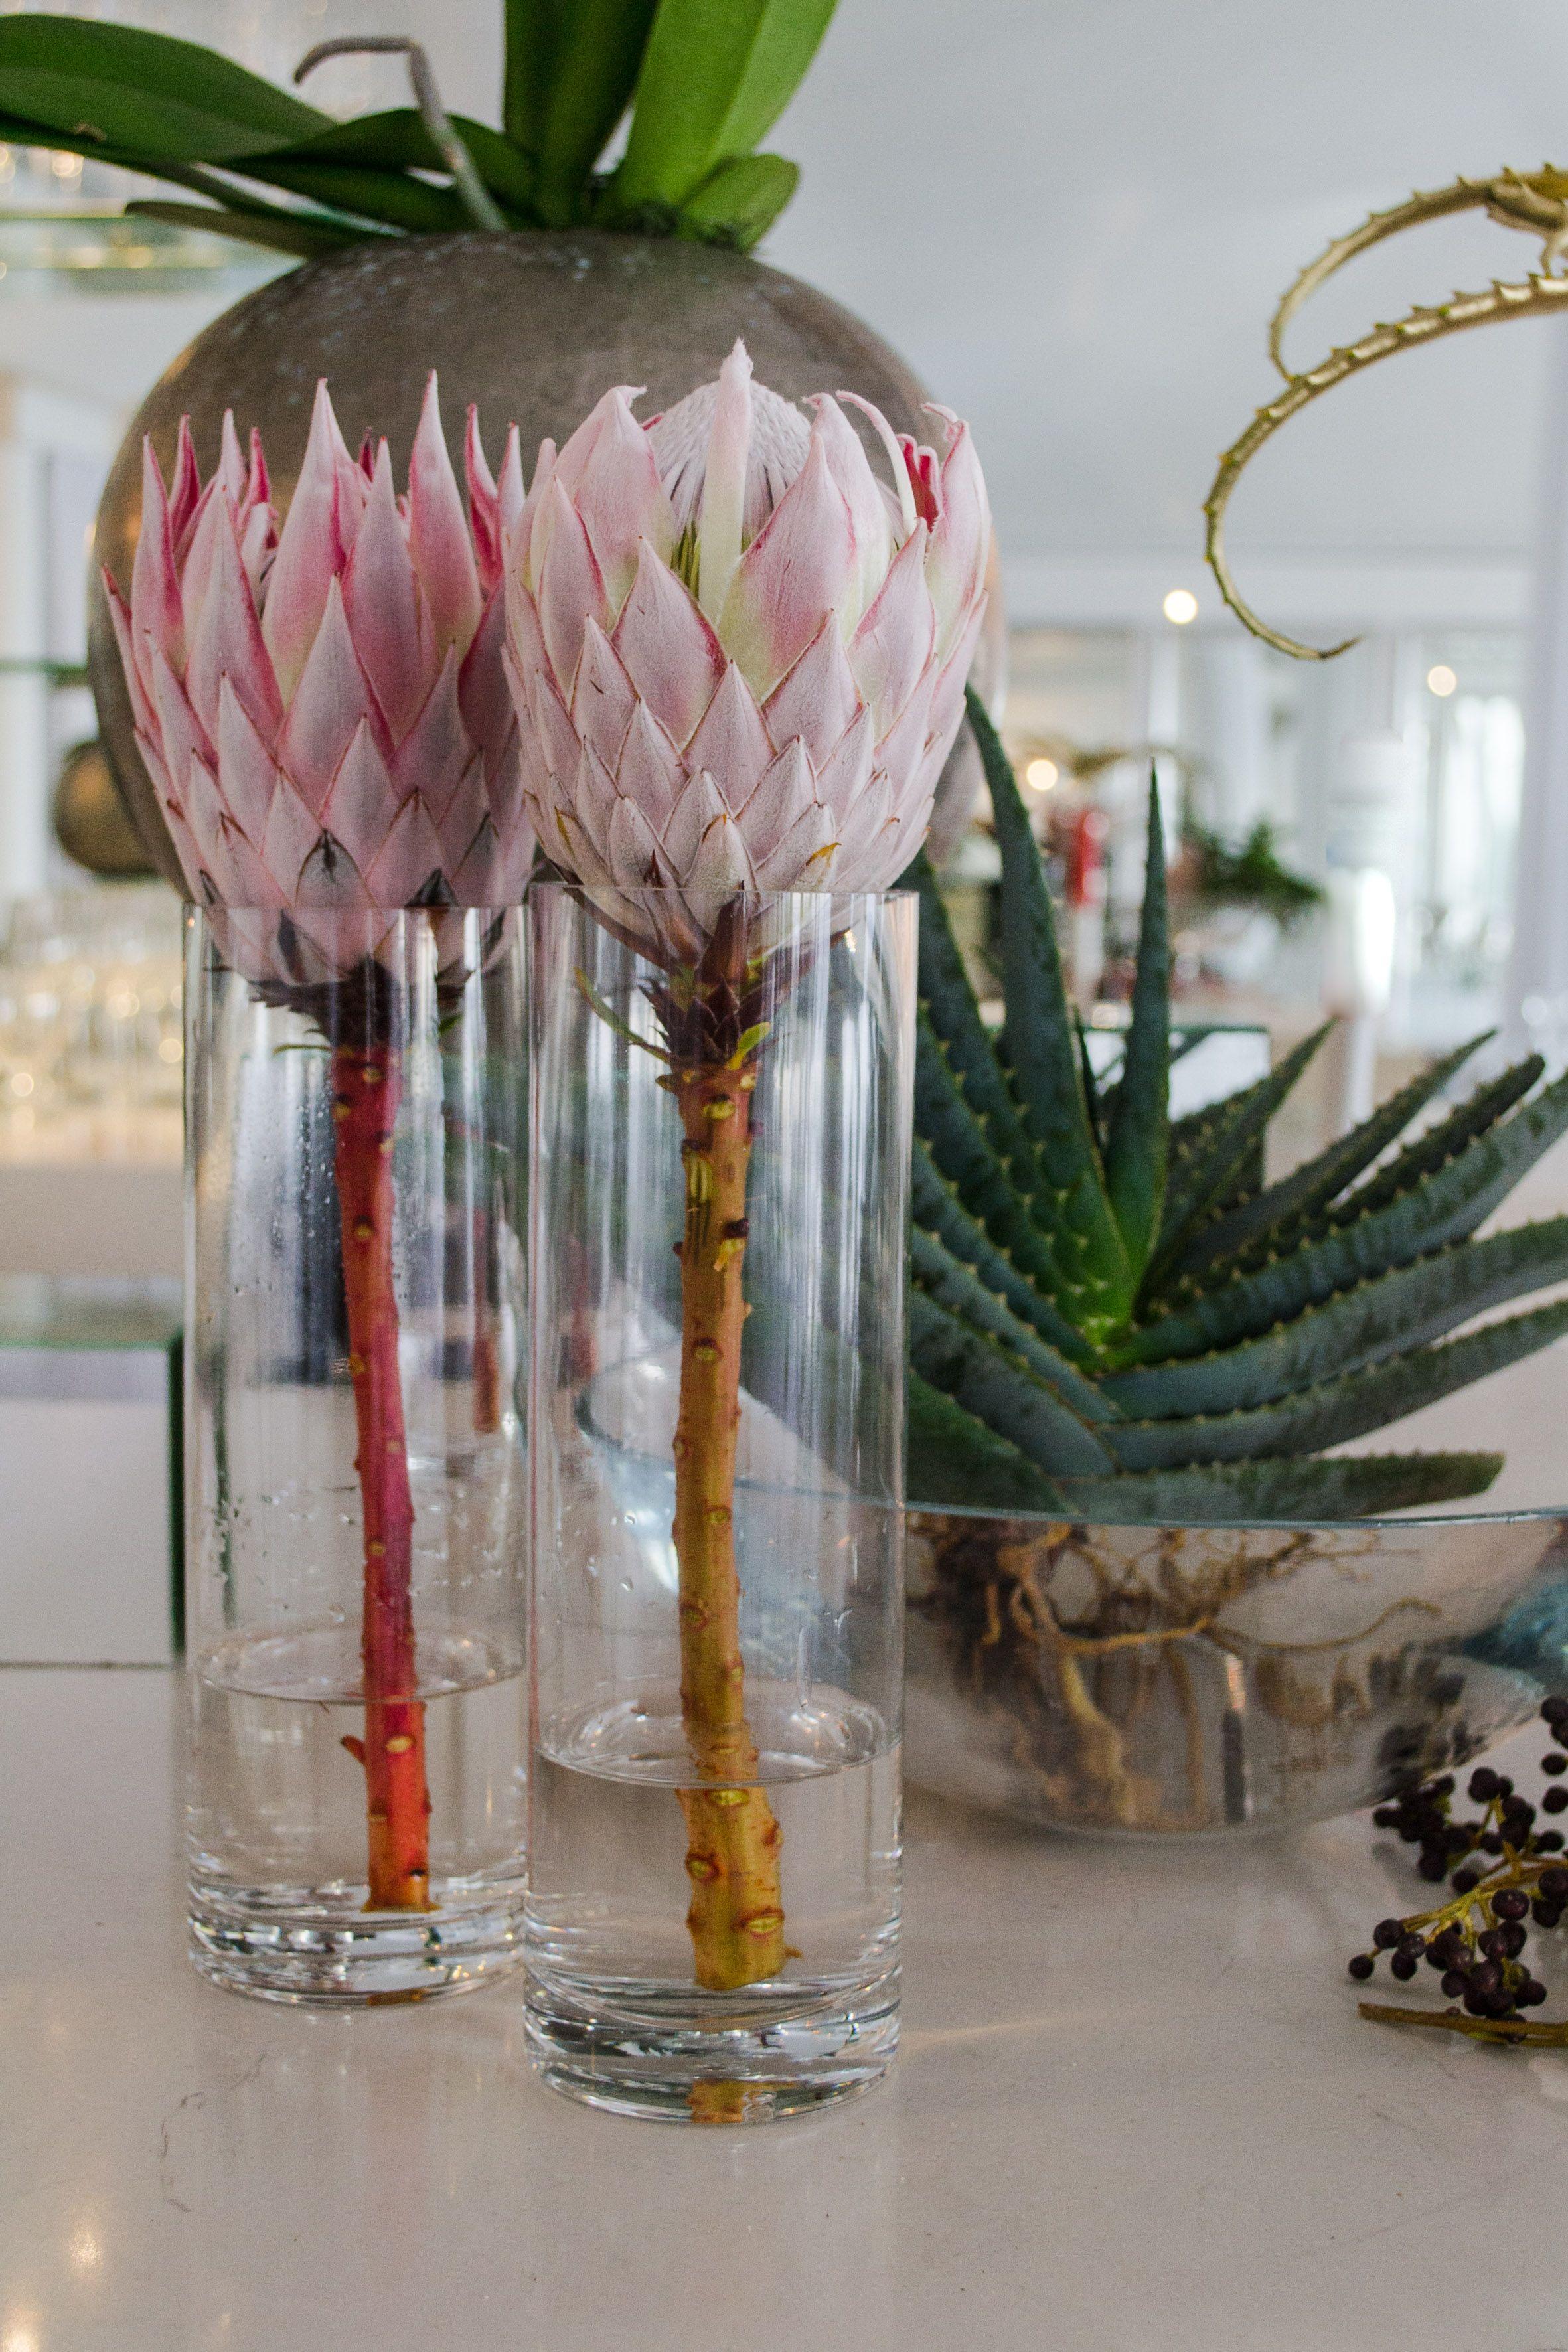 Proteas flower arrangement wedding decor sorrento for King protea flower arrangements